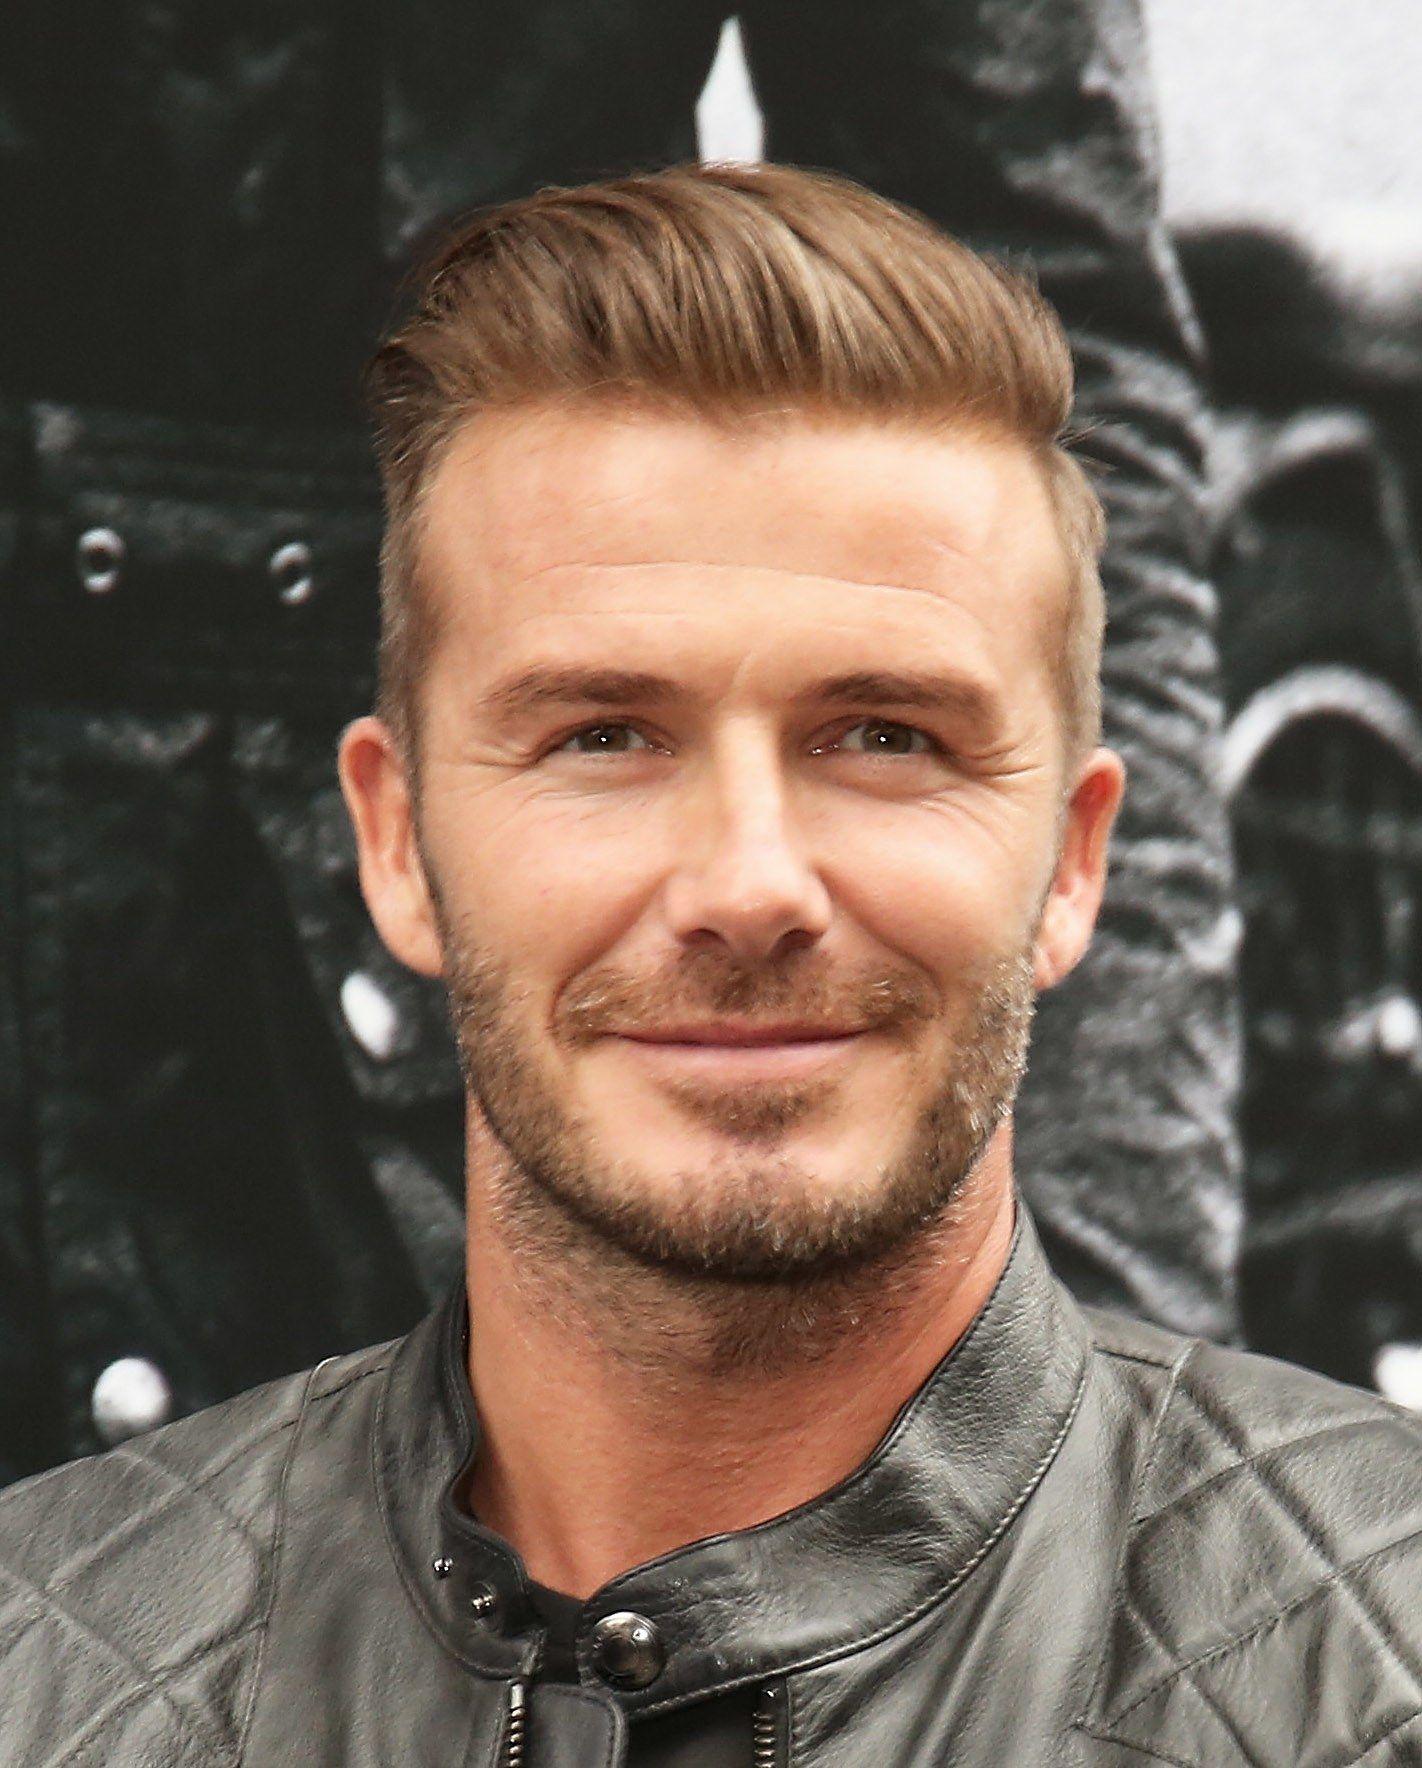 how to get every david beckham haircut | boys hair | beckham